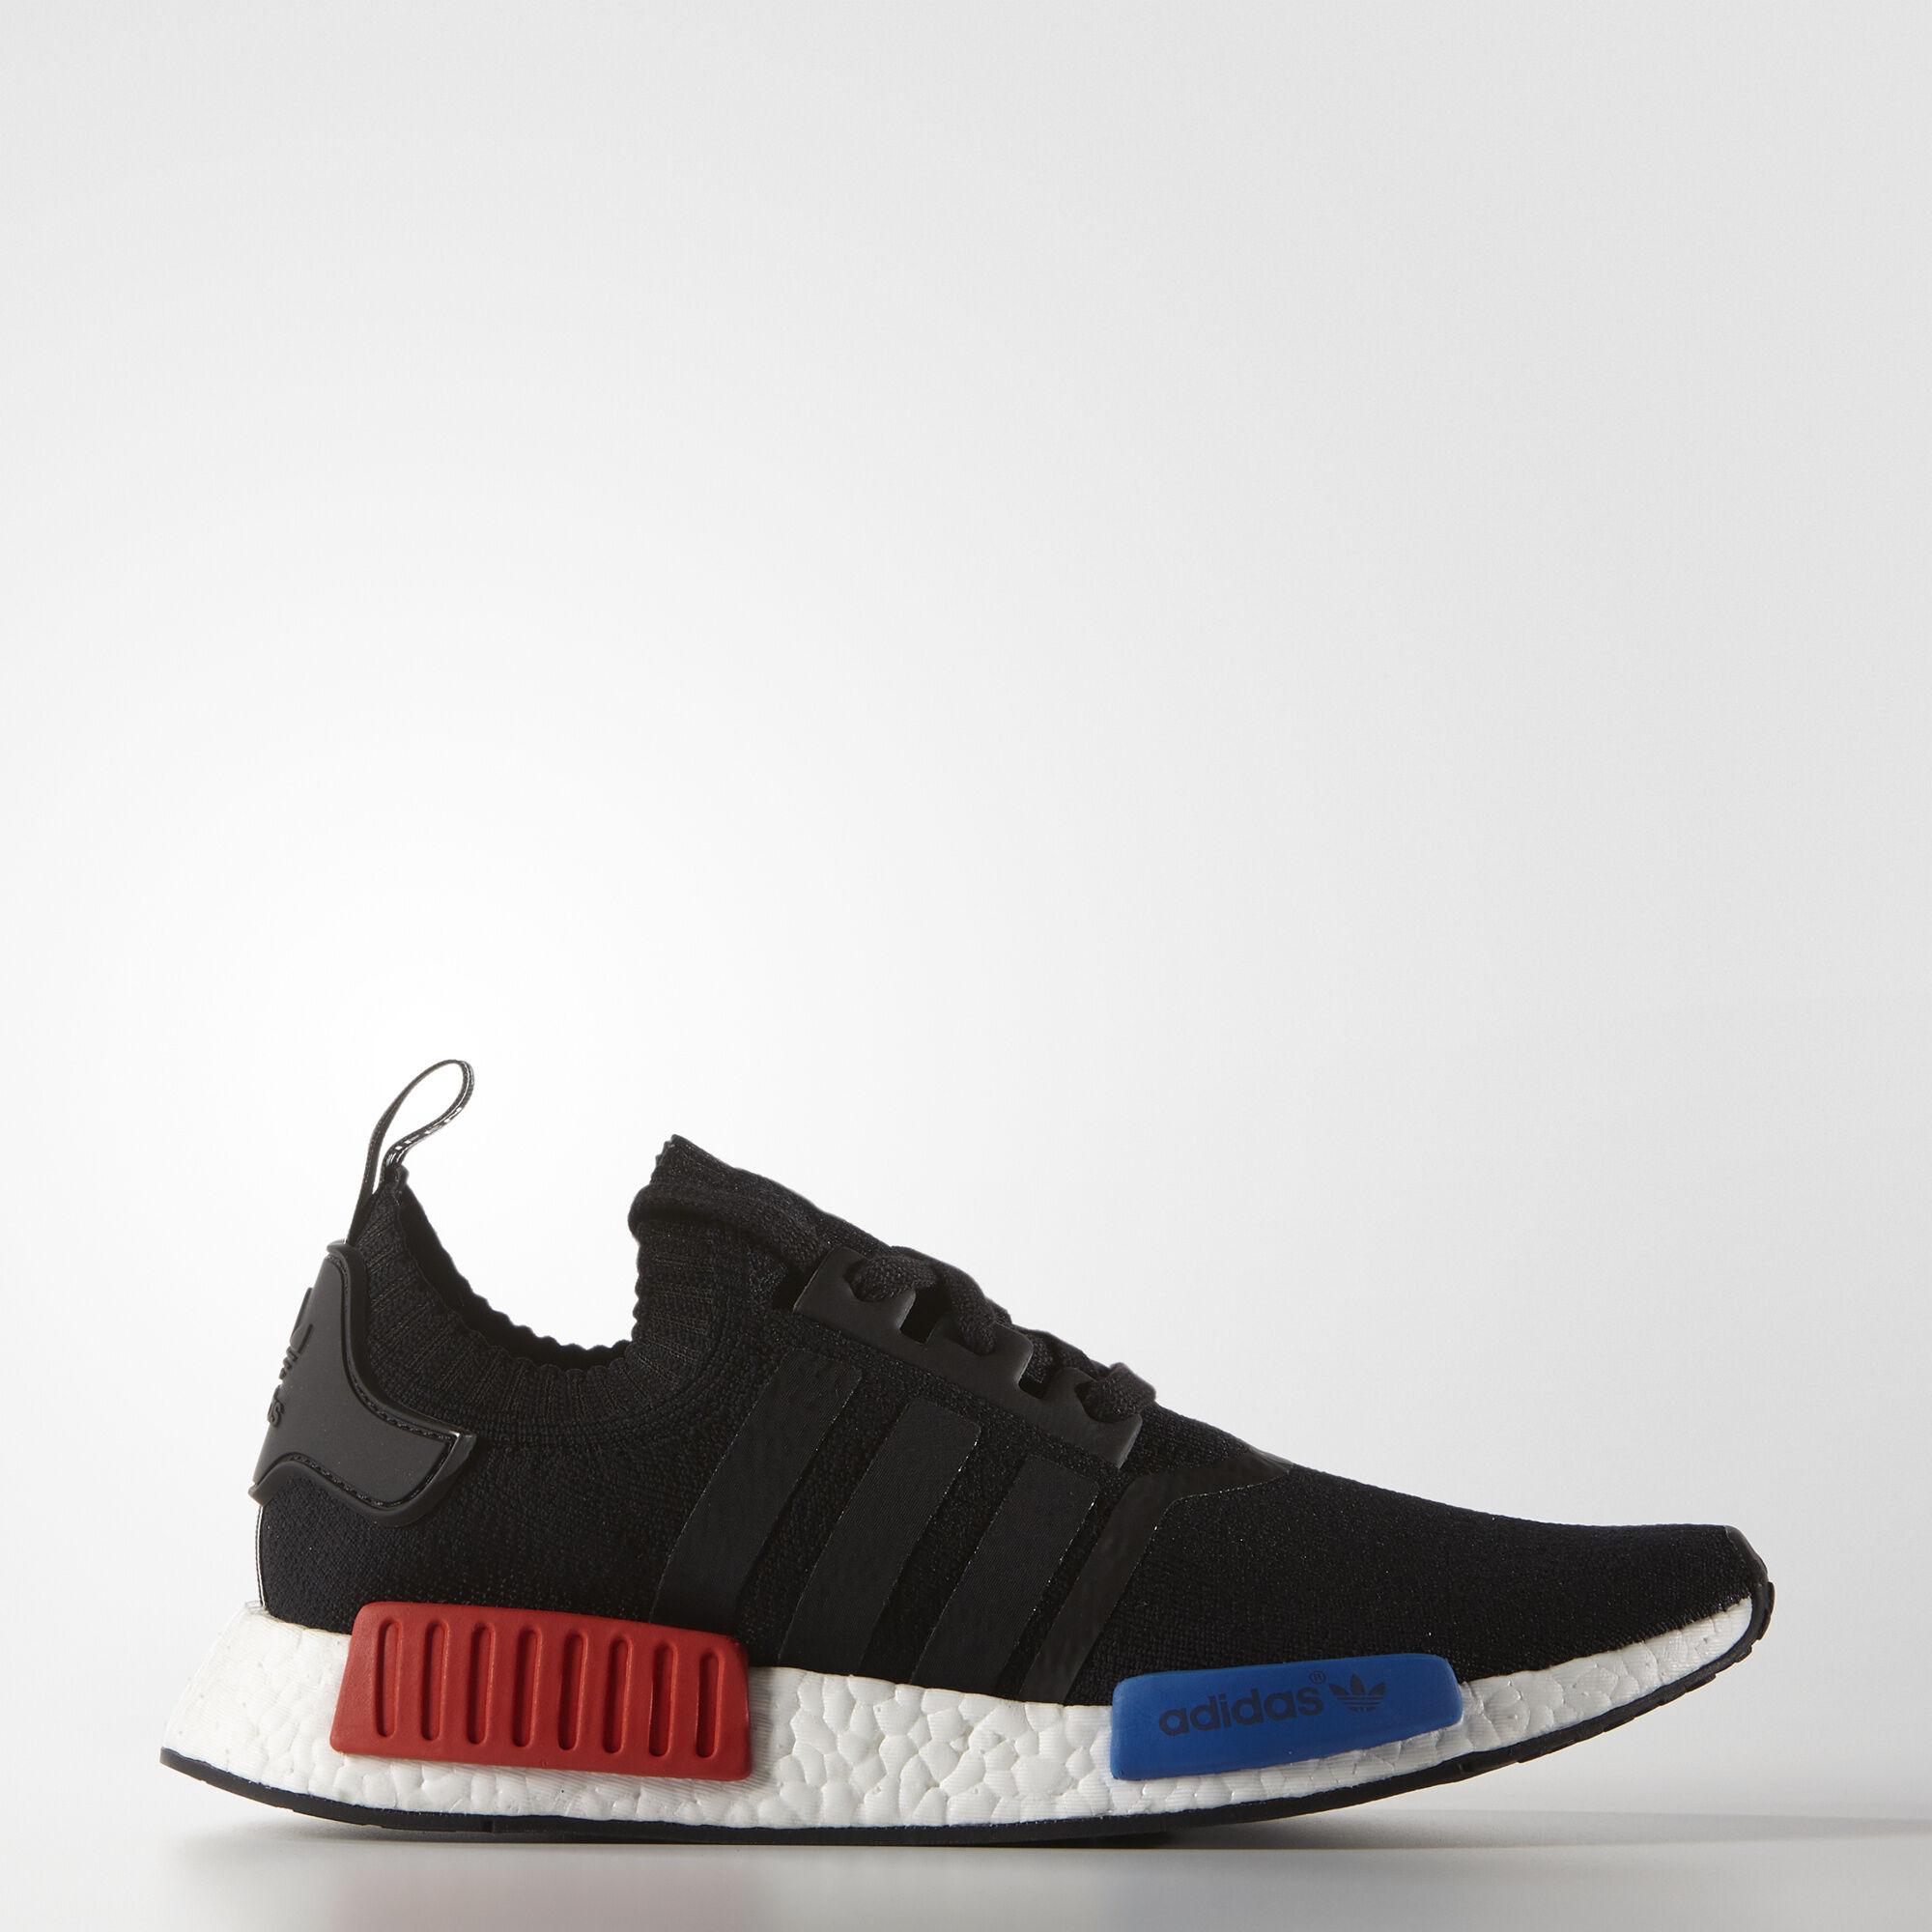 Adidas Nmd Runner Negras